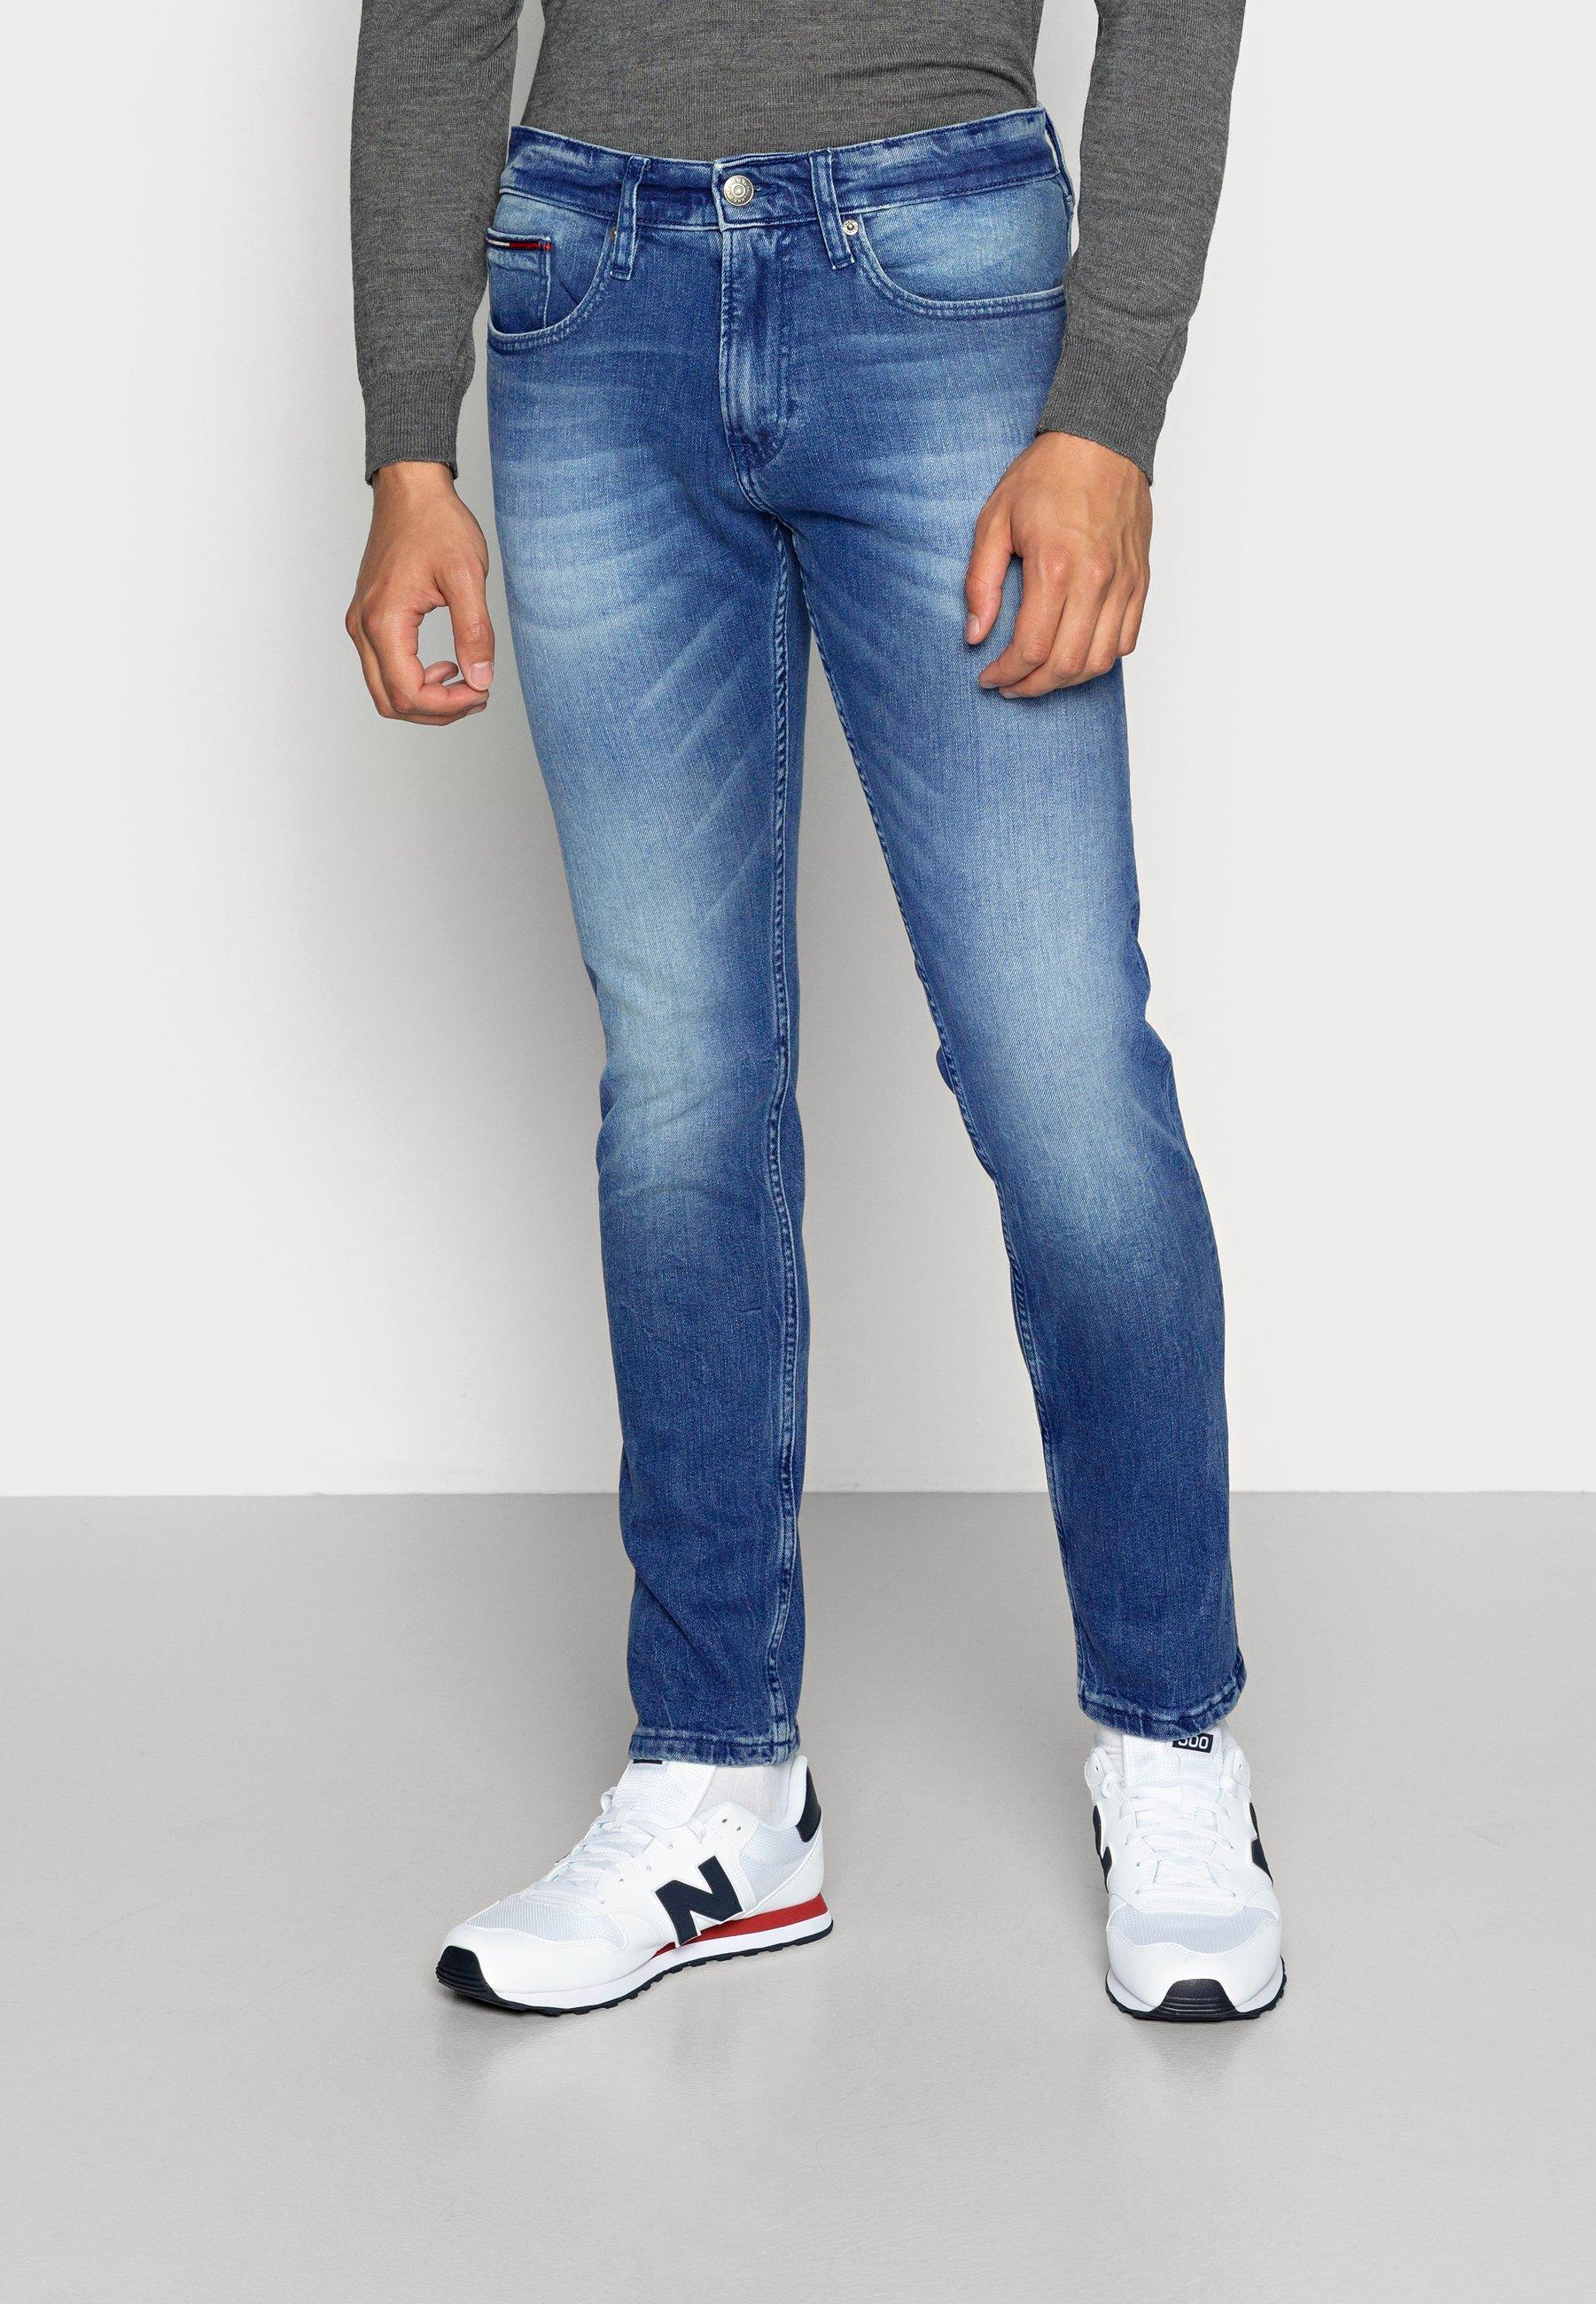 Men SLIM TAPERED STEVE BEMB - Slim fit jeans - berry mid blue